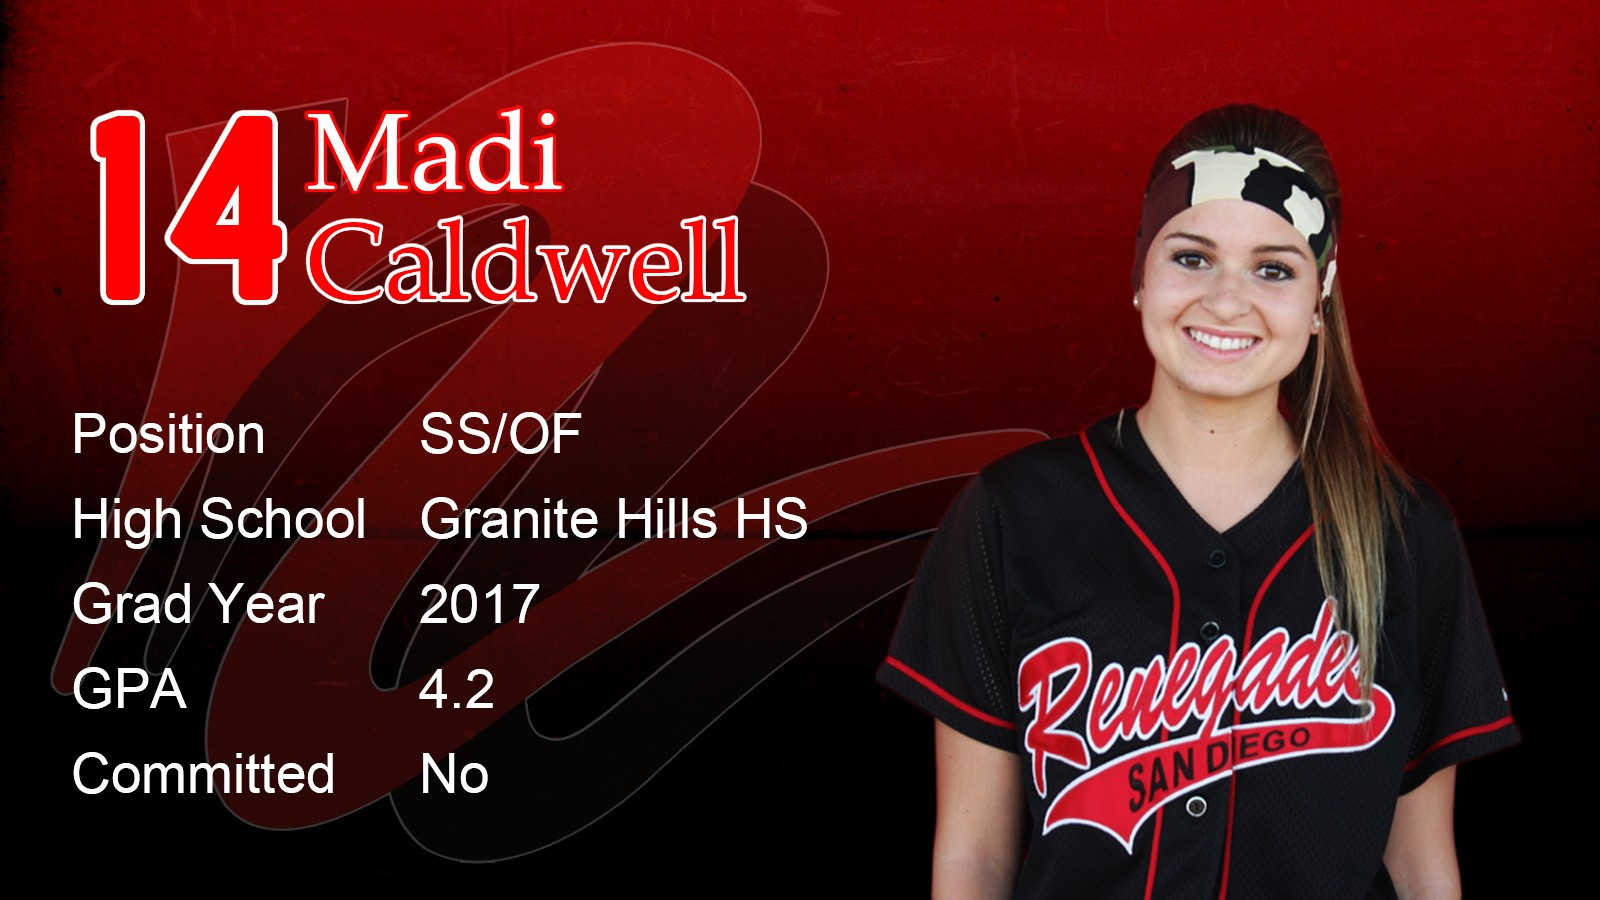 Madi-Caldwell